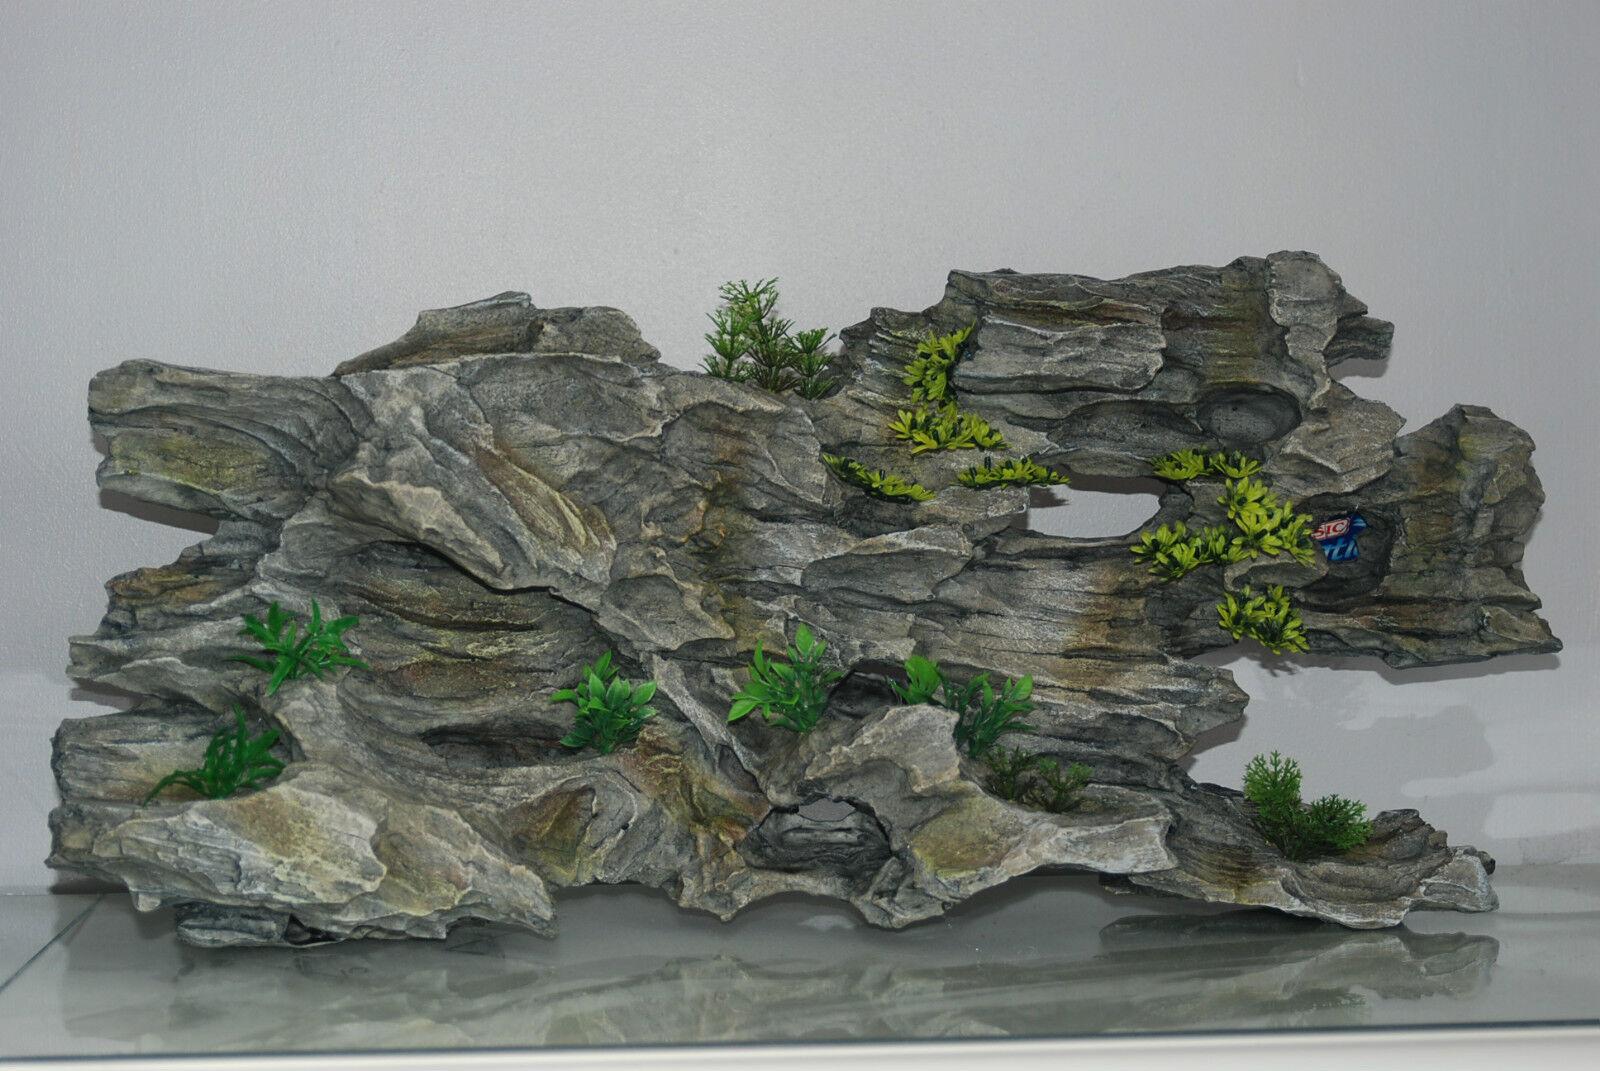 Stunning Realistic Giant Aquarium Driftwood & Plants Decoration 64x13x30 cms